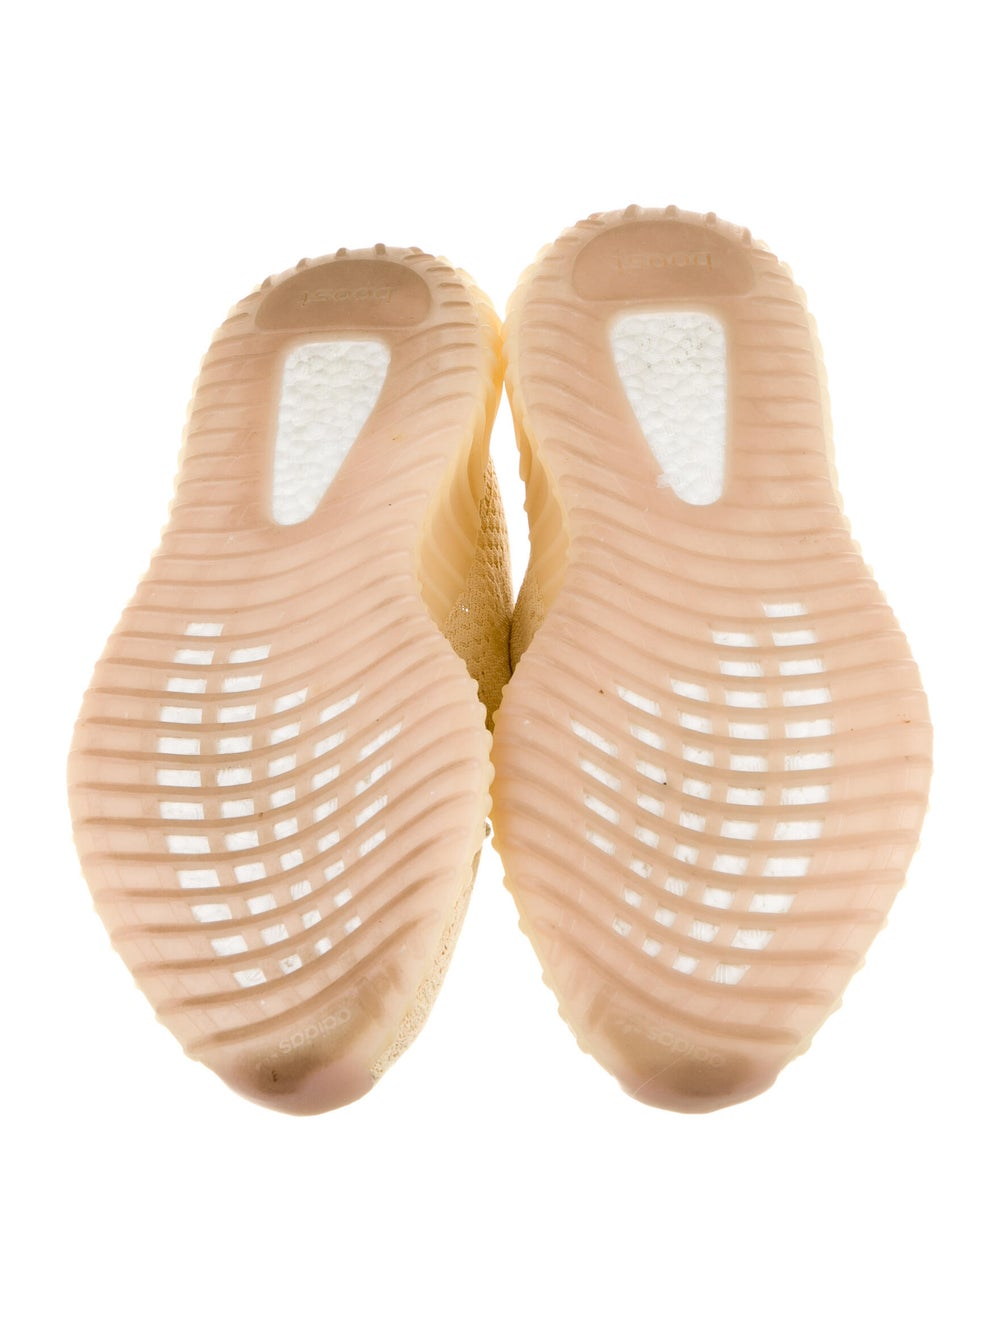 Yeezy x adidas Boost 350 V2 Linen Sneakers Sneake… - image 5